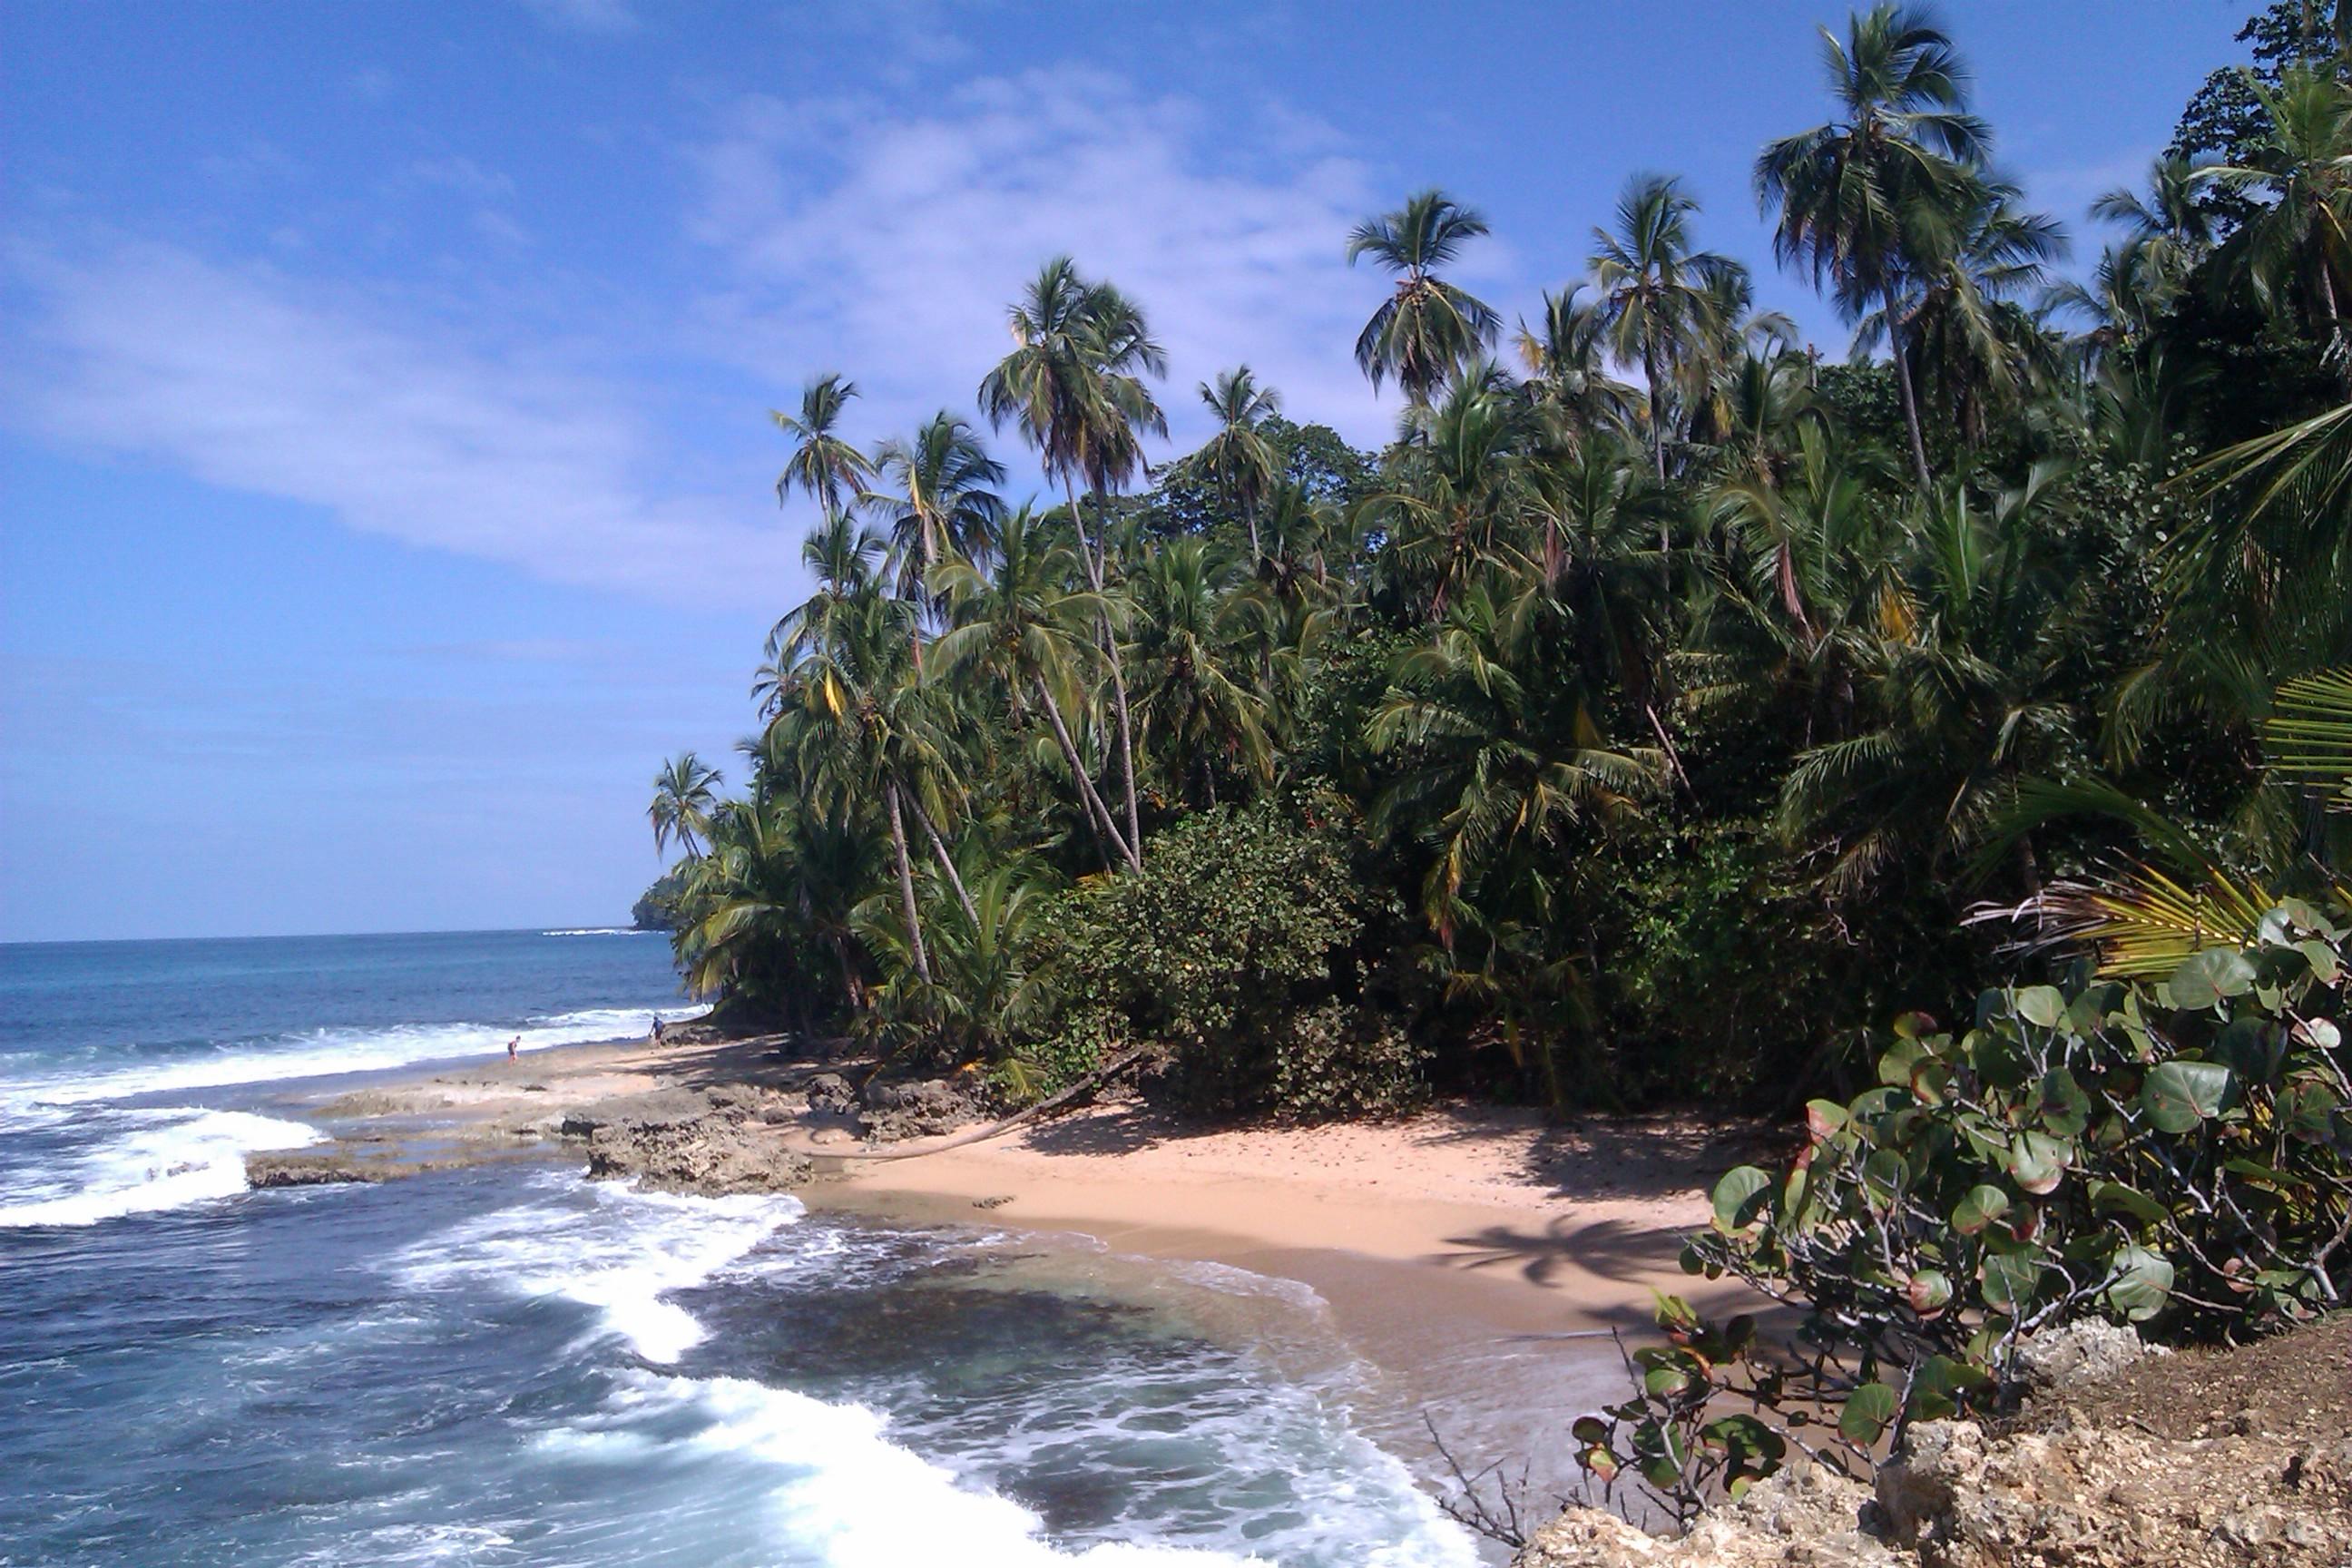 Puerto Viejo de Talamanca Costa Rica Tours